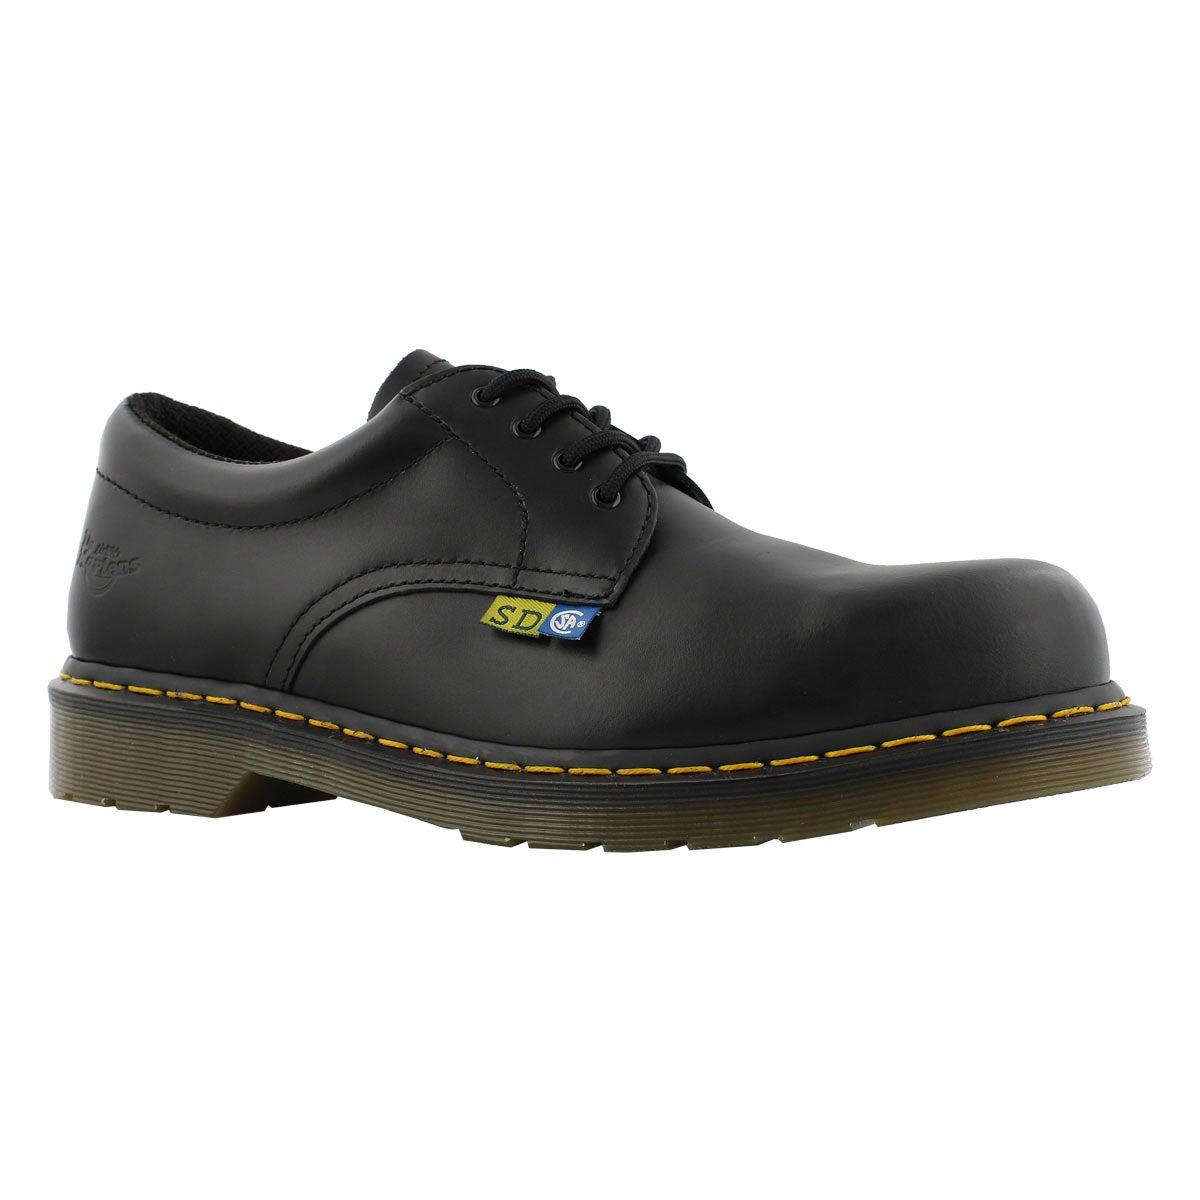 Mns Gibson black CSA safety shoe